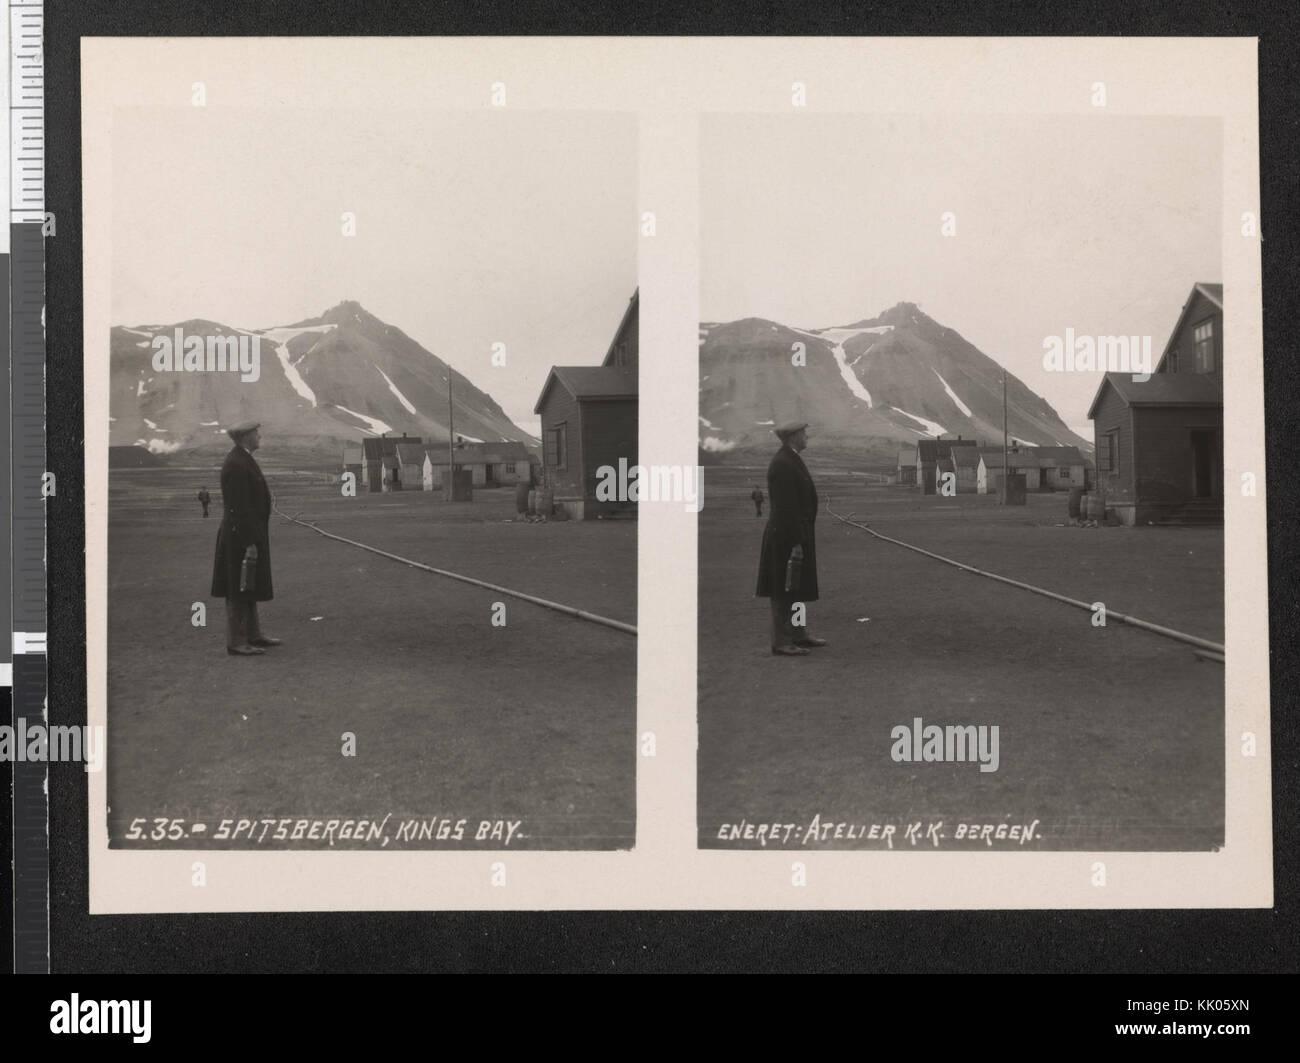 S. 35. Spitsbergen, Kings Bay stereofotografi n. nb digifoto 20151013 00125 bldsa 0977 stereo Immagini Stock